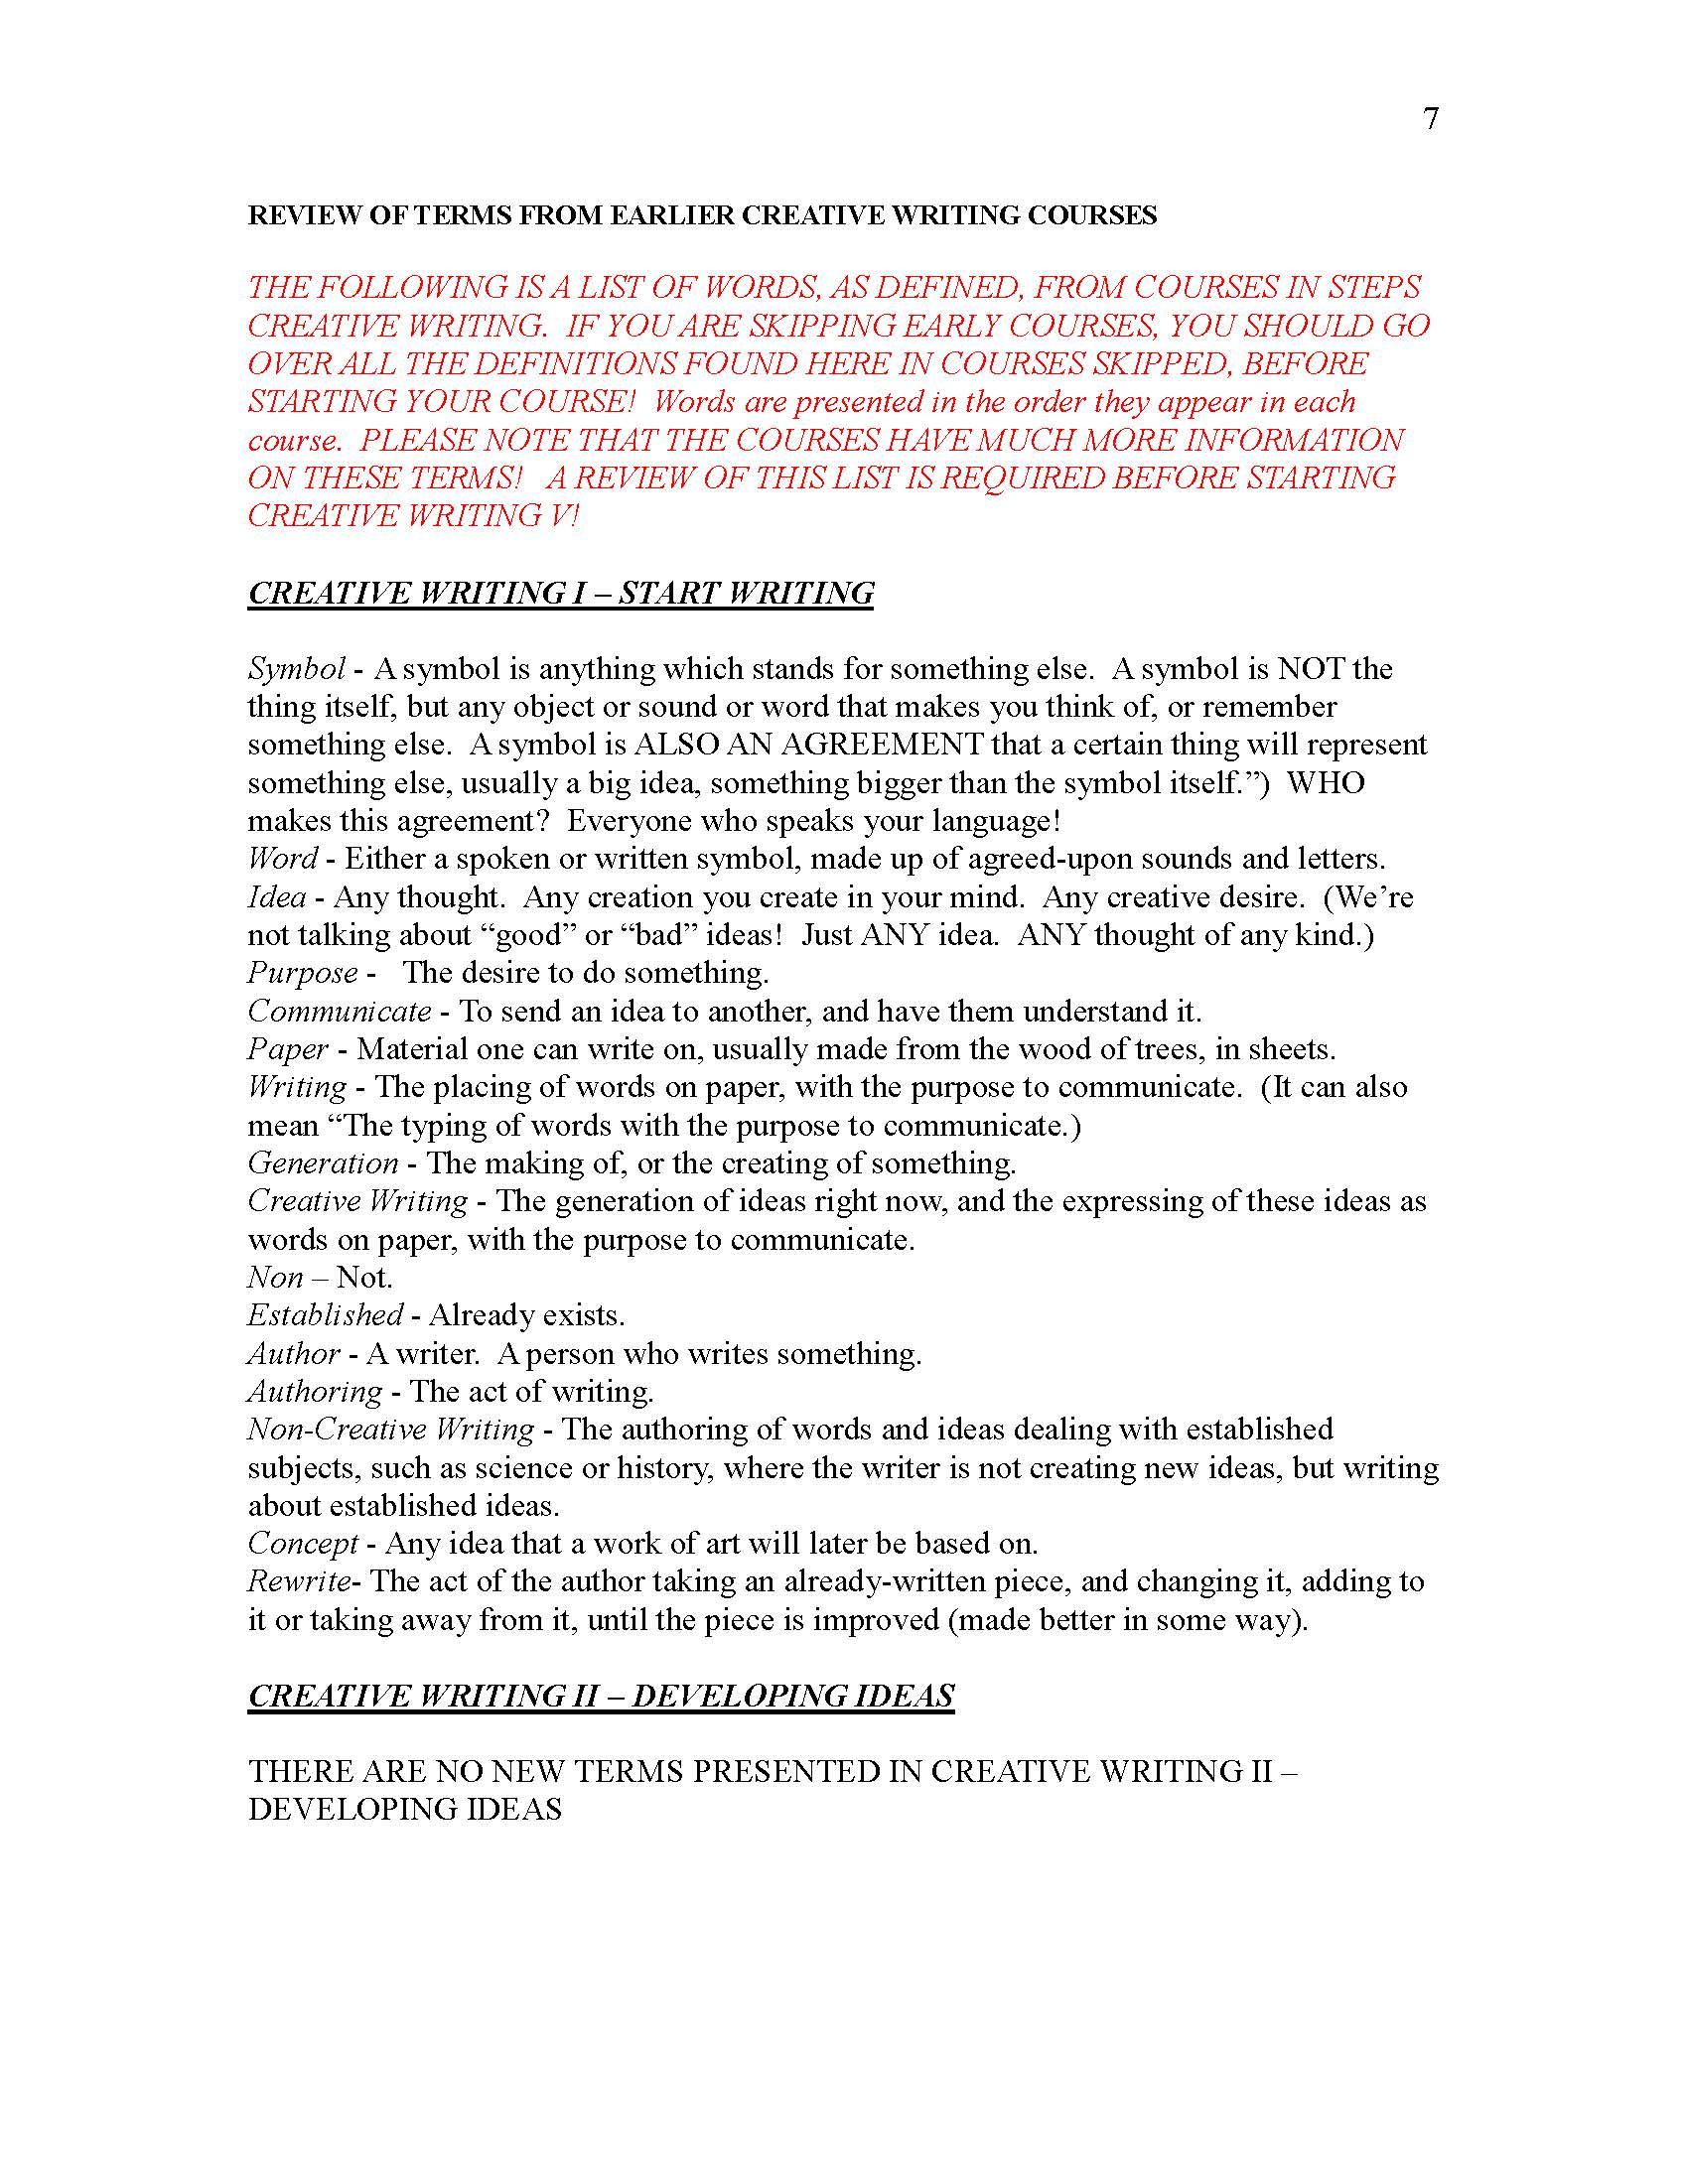 Step 4 Creative Writing 5 - The Field_Page_008.jpg